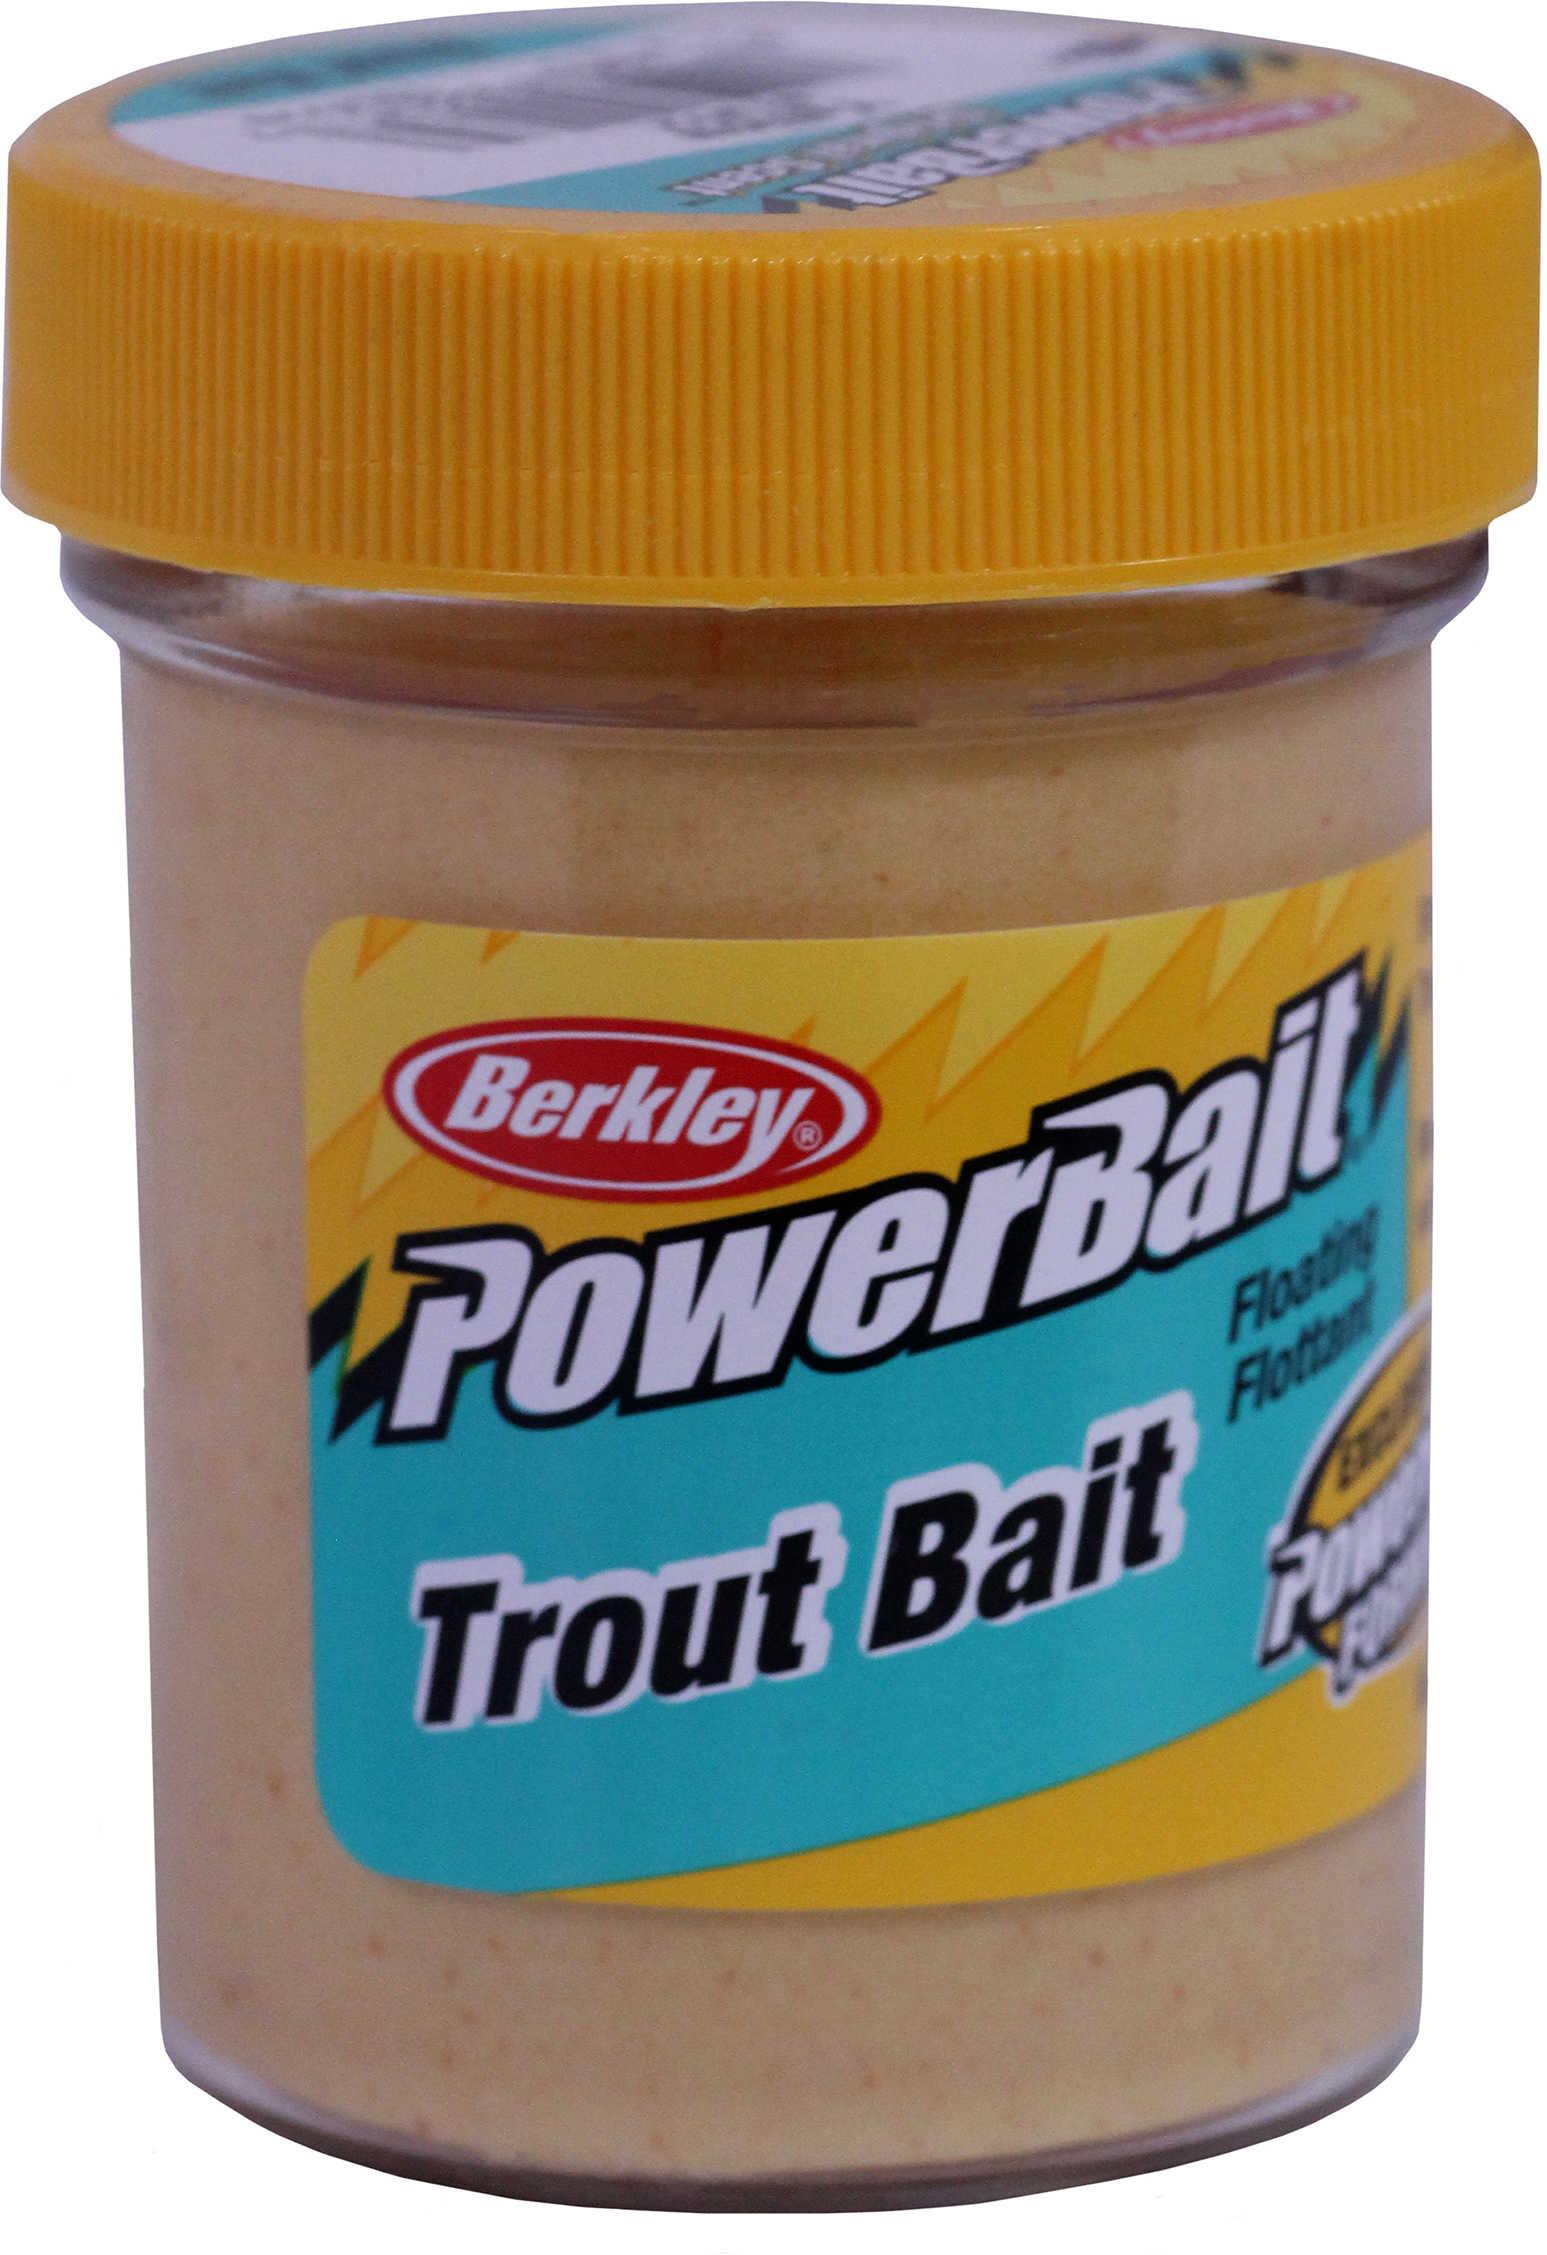 Berkley Biodegradable Trout Bait 1.75 oz. Yellow Md#: TBY2